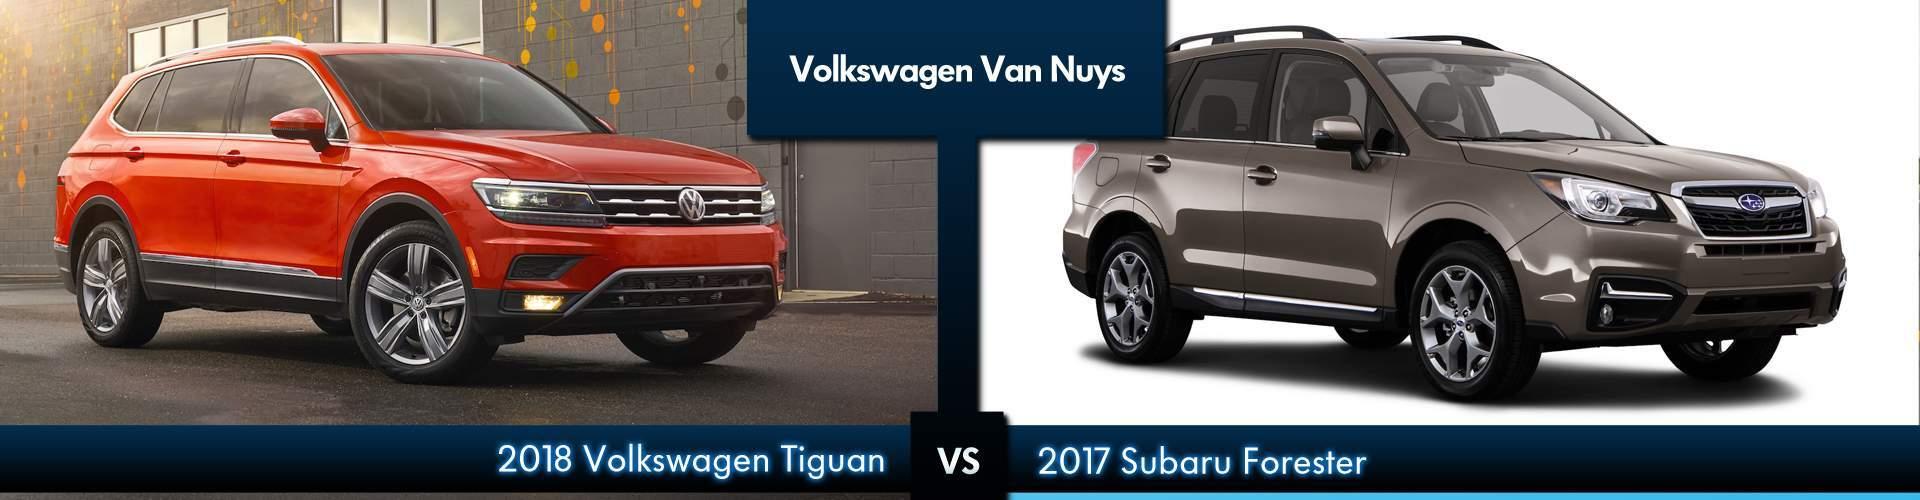 Compare The All New Volkswagen Tiguan To Subaru Forester Van Nuys Ca San Fernando Valley